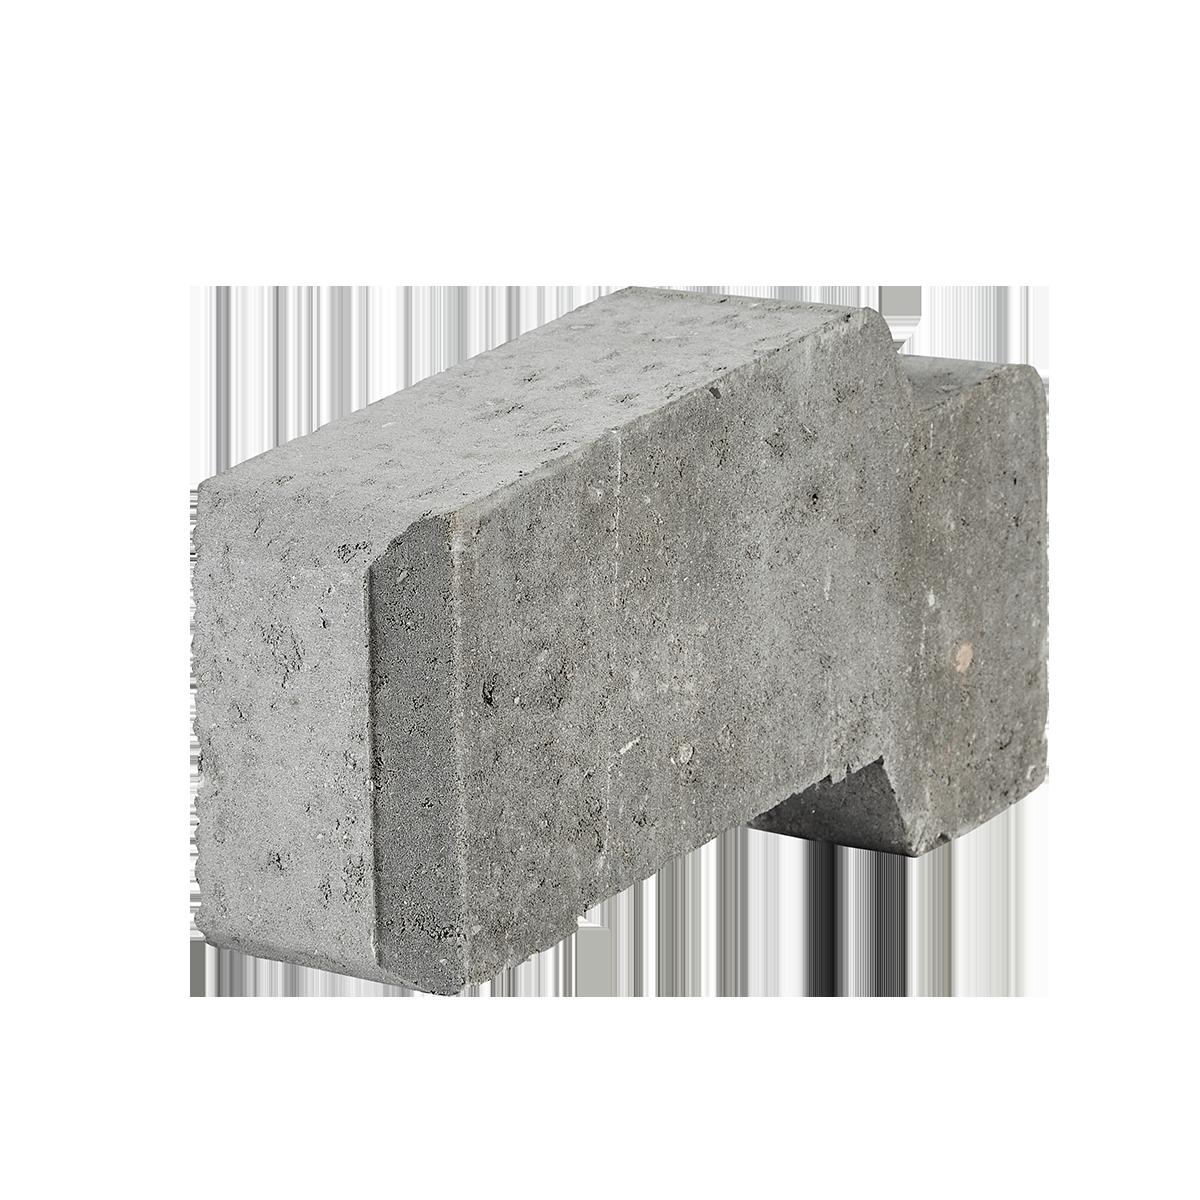 Danblokke 12,5x34x17 cm Grå 1/2-blok (massiv)